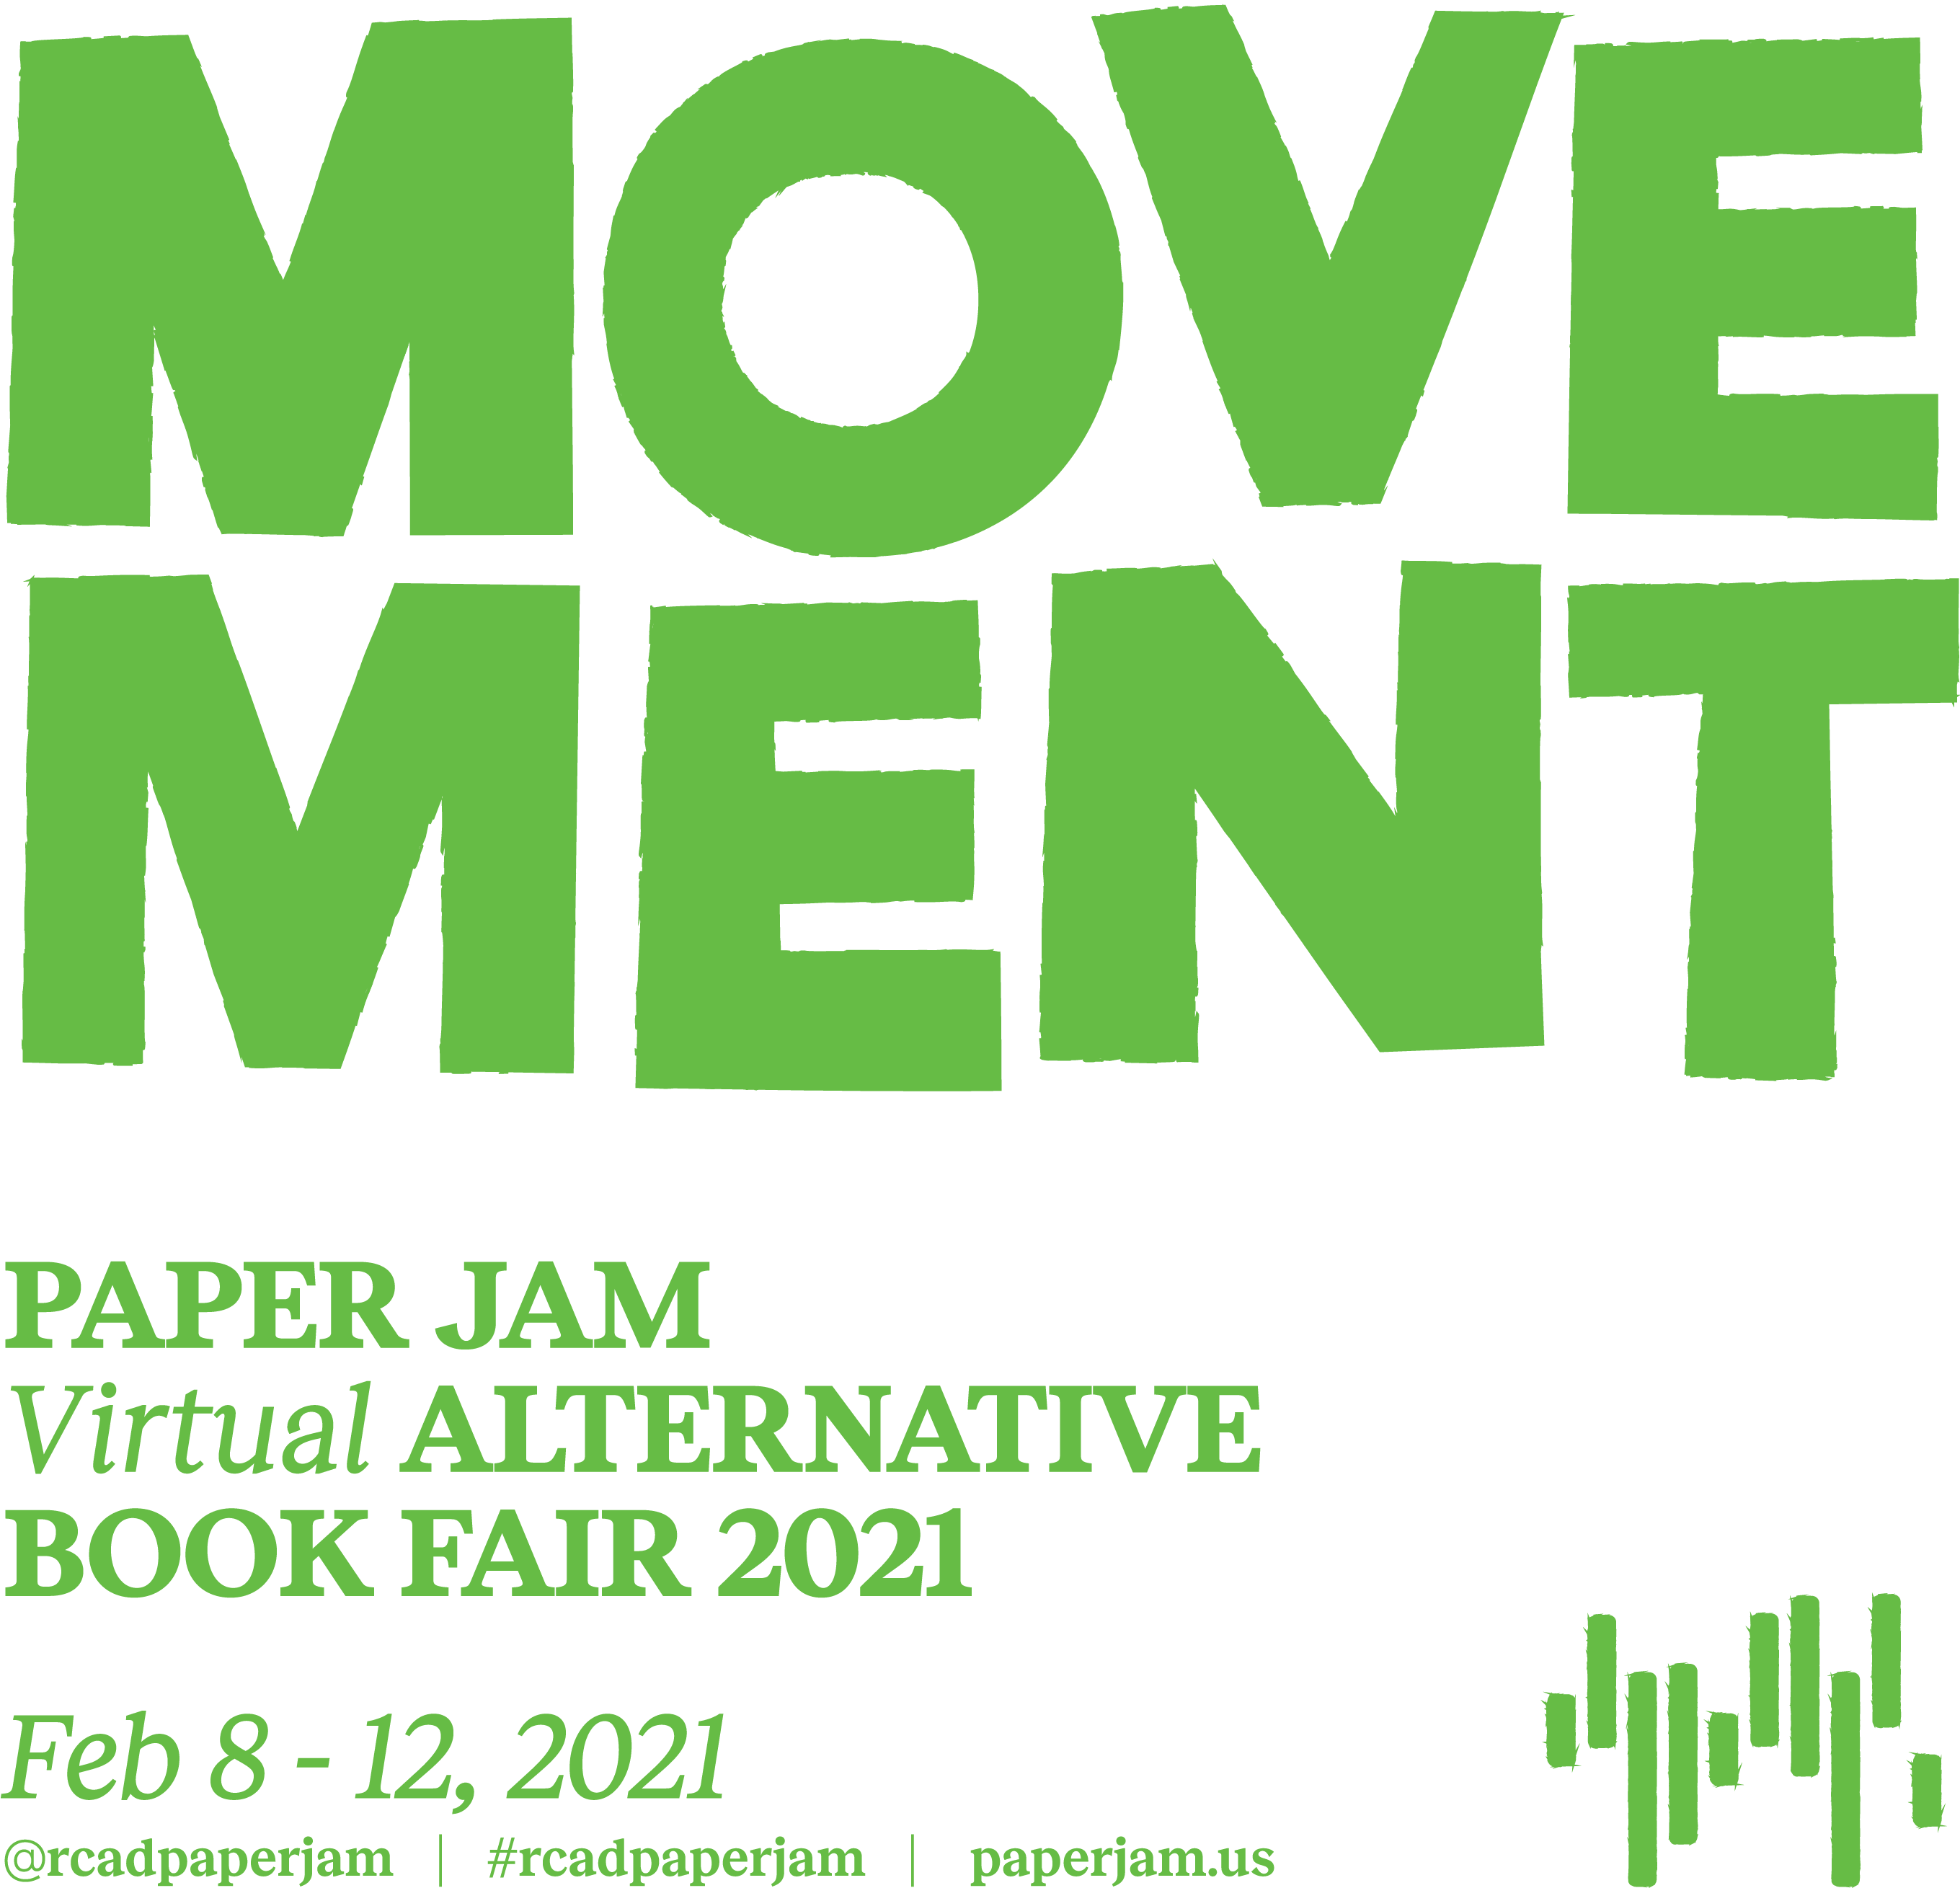 paper jam logo